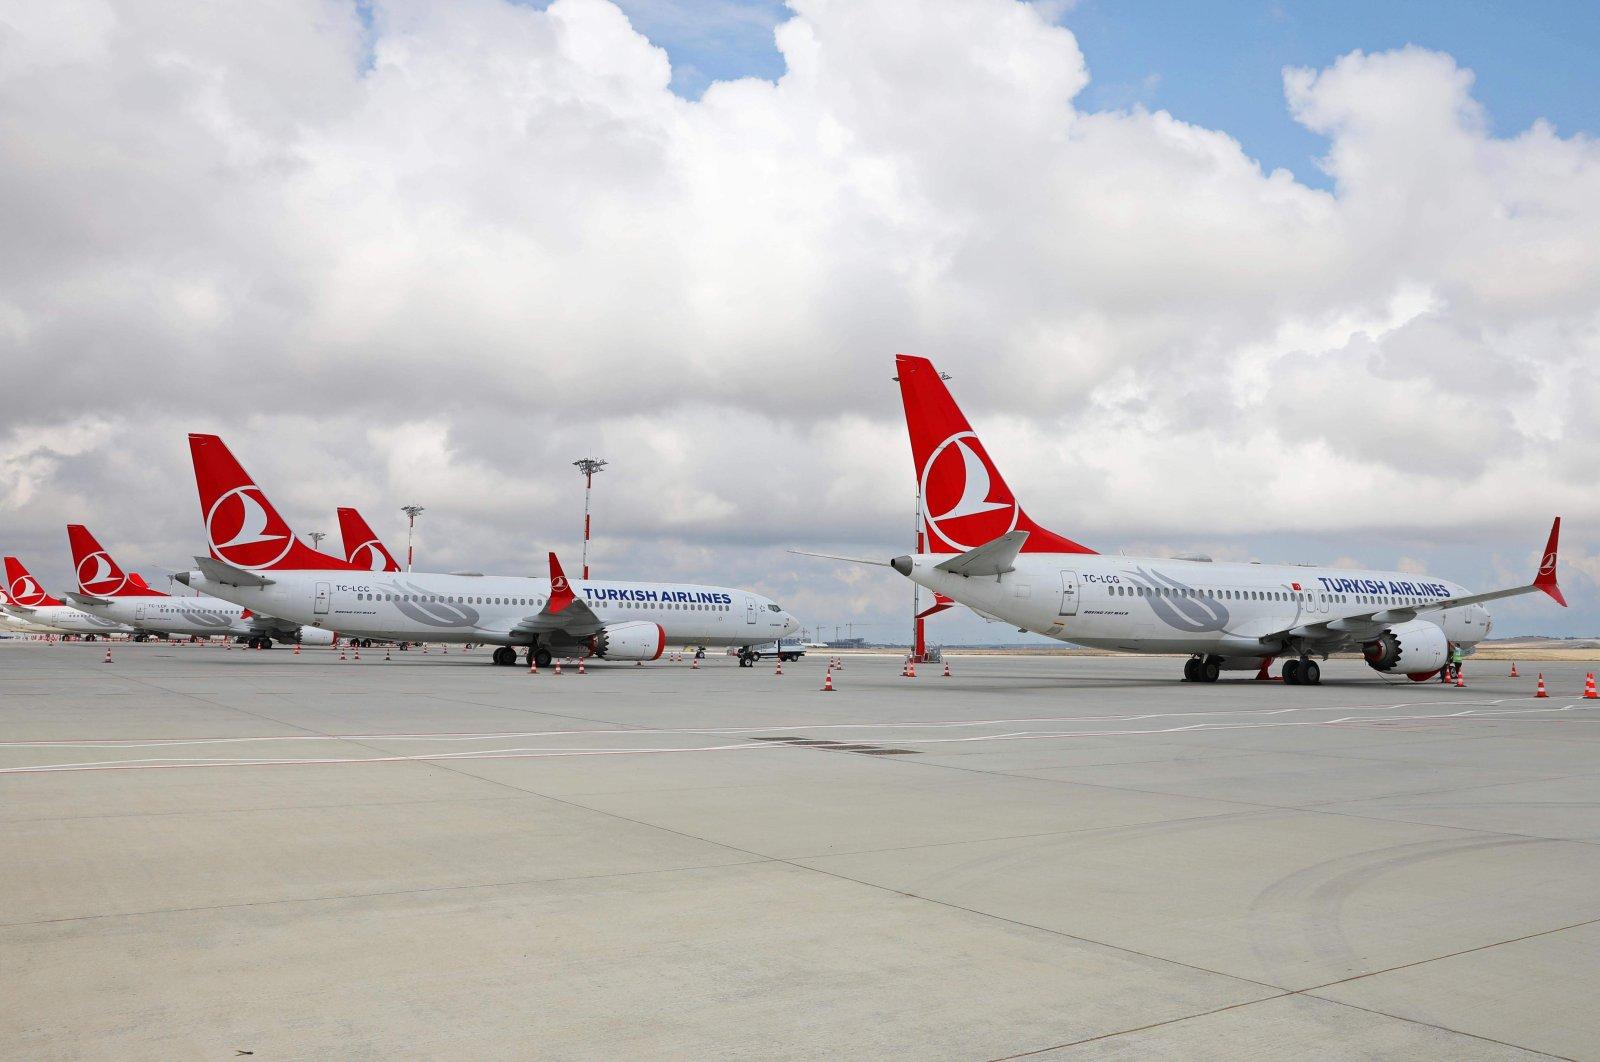 Turkish Airlines to restart flights from UK, Denmark